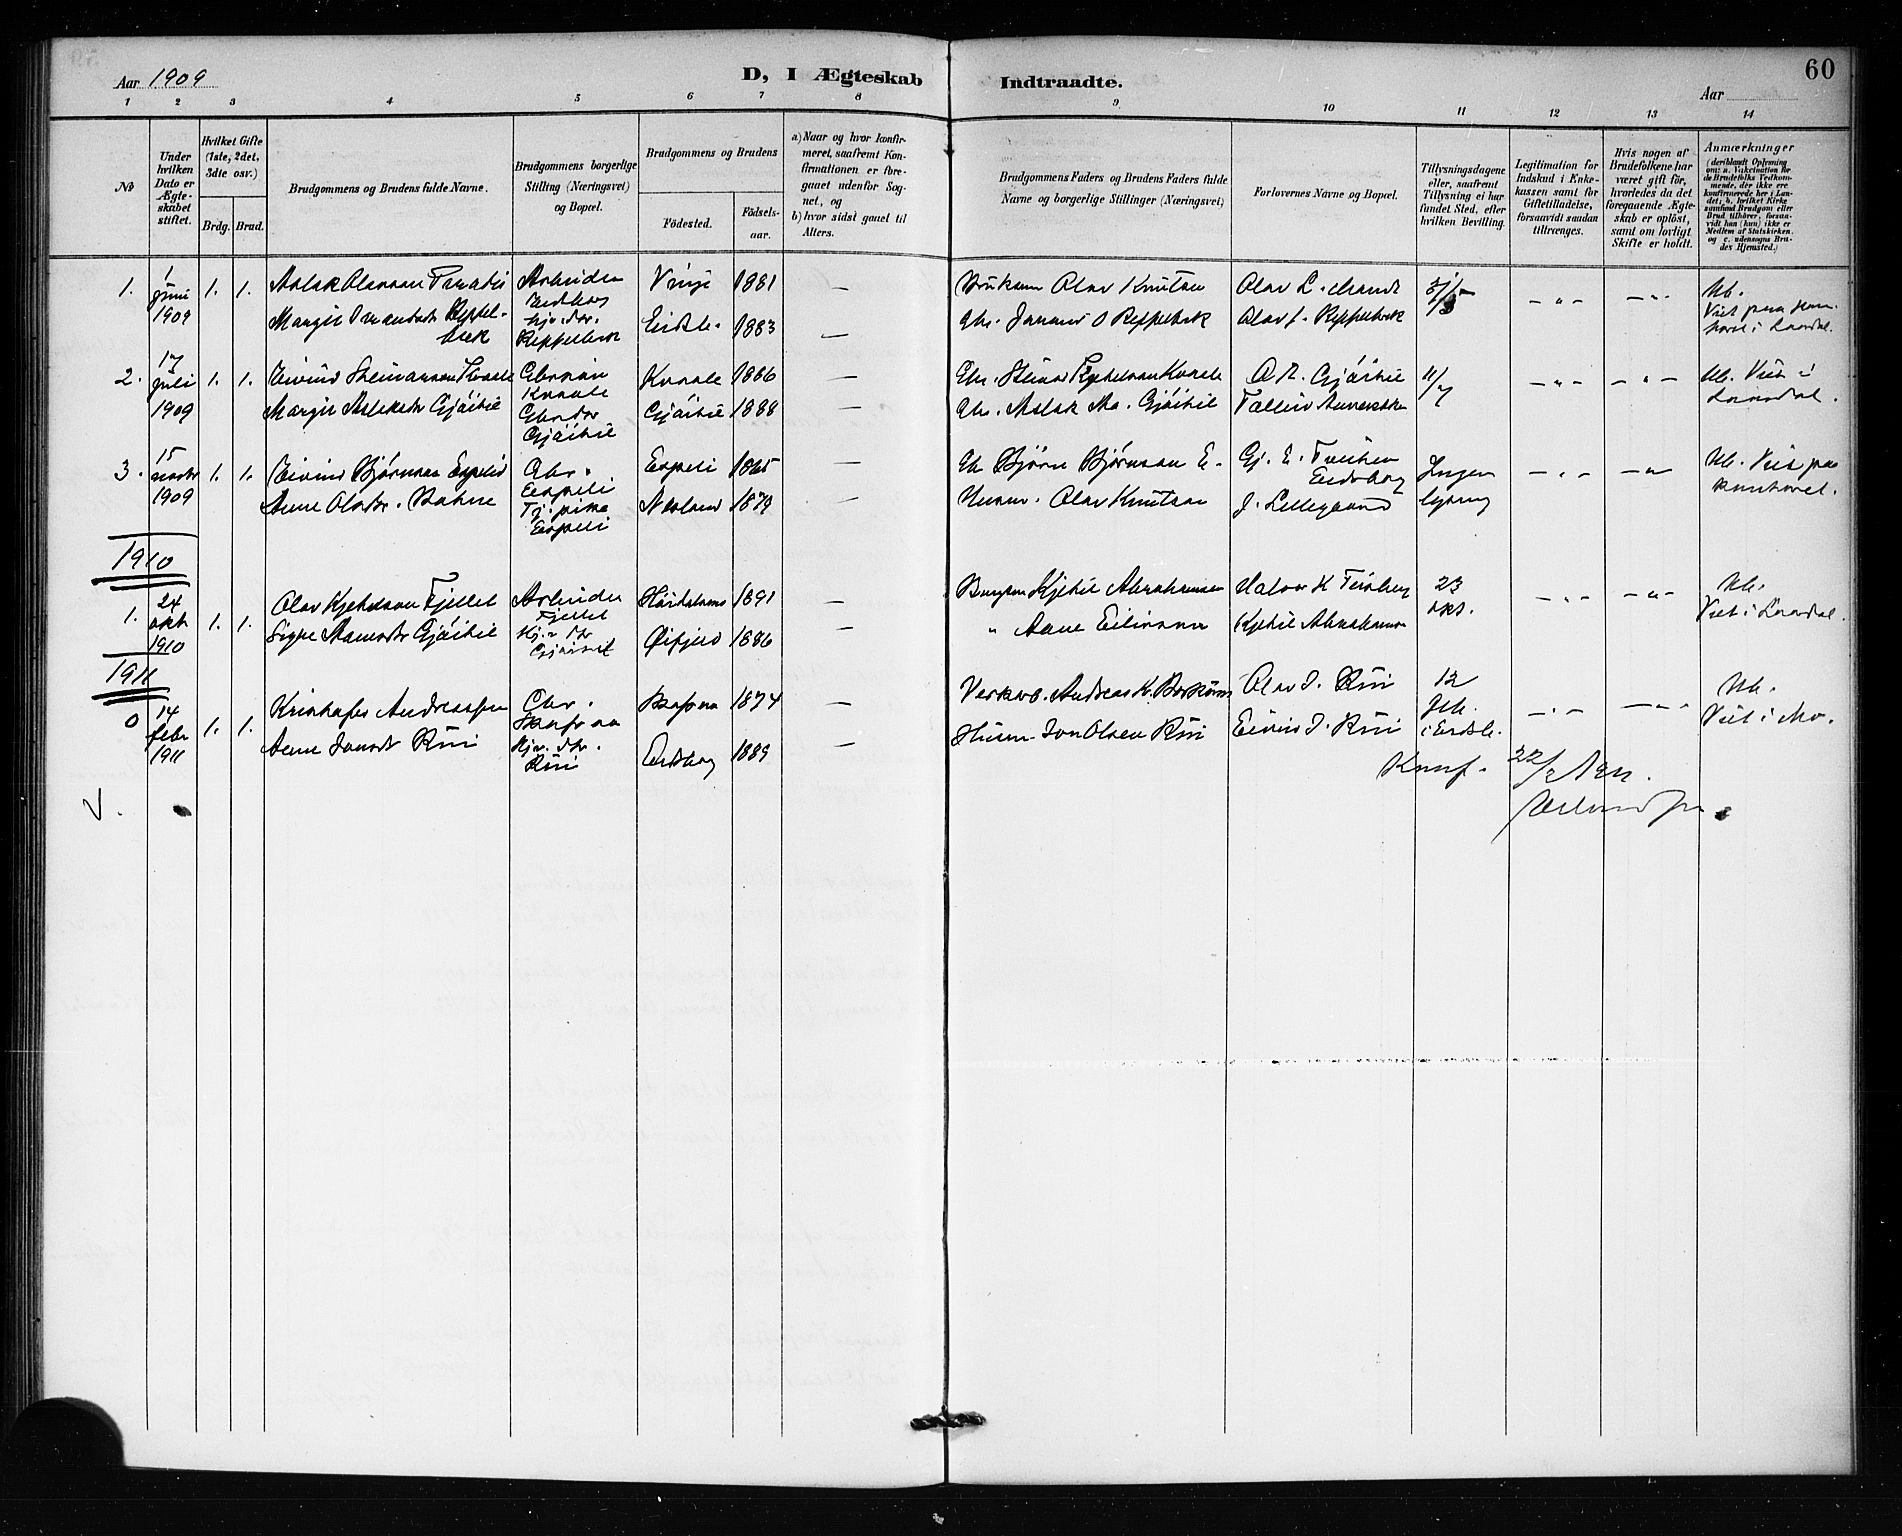 SAKO, Lårdal kirkebøker, G/Gb/L0003: Klokkerbok nr. II 3, 1889-1920, s. 60